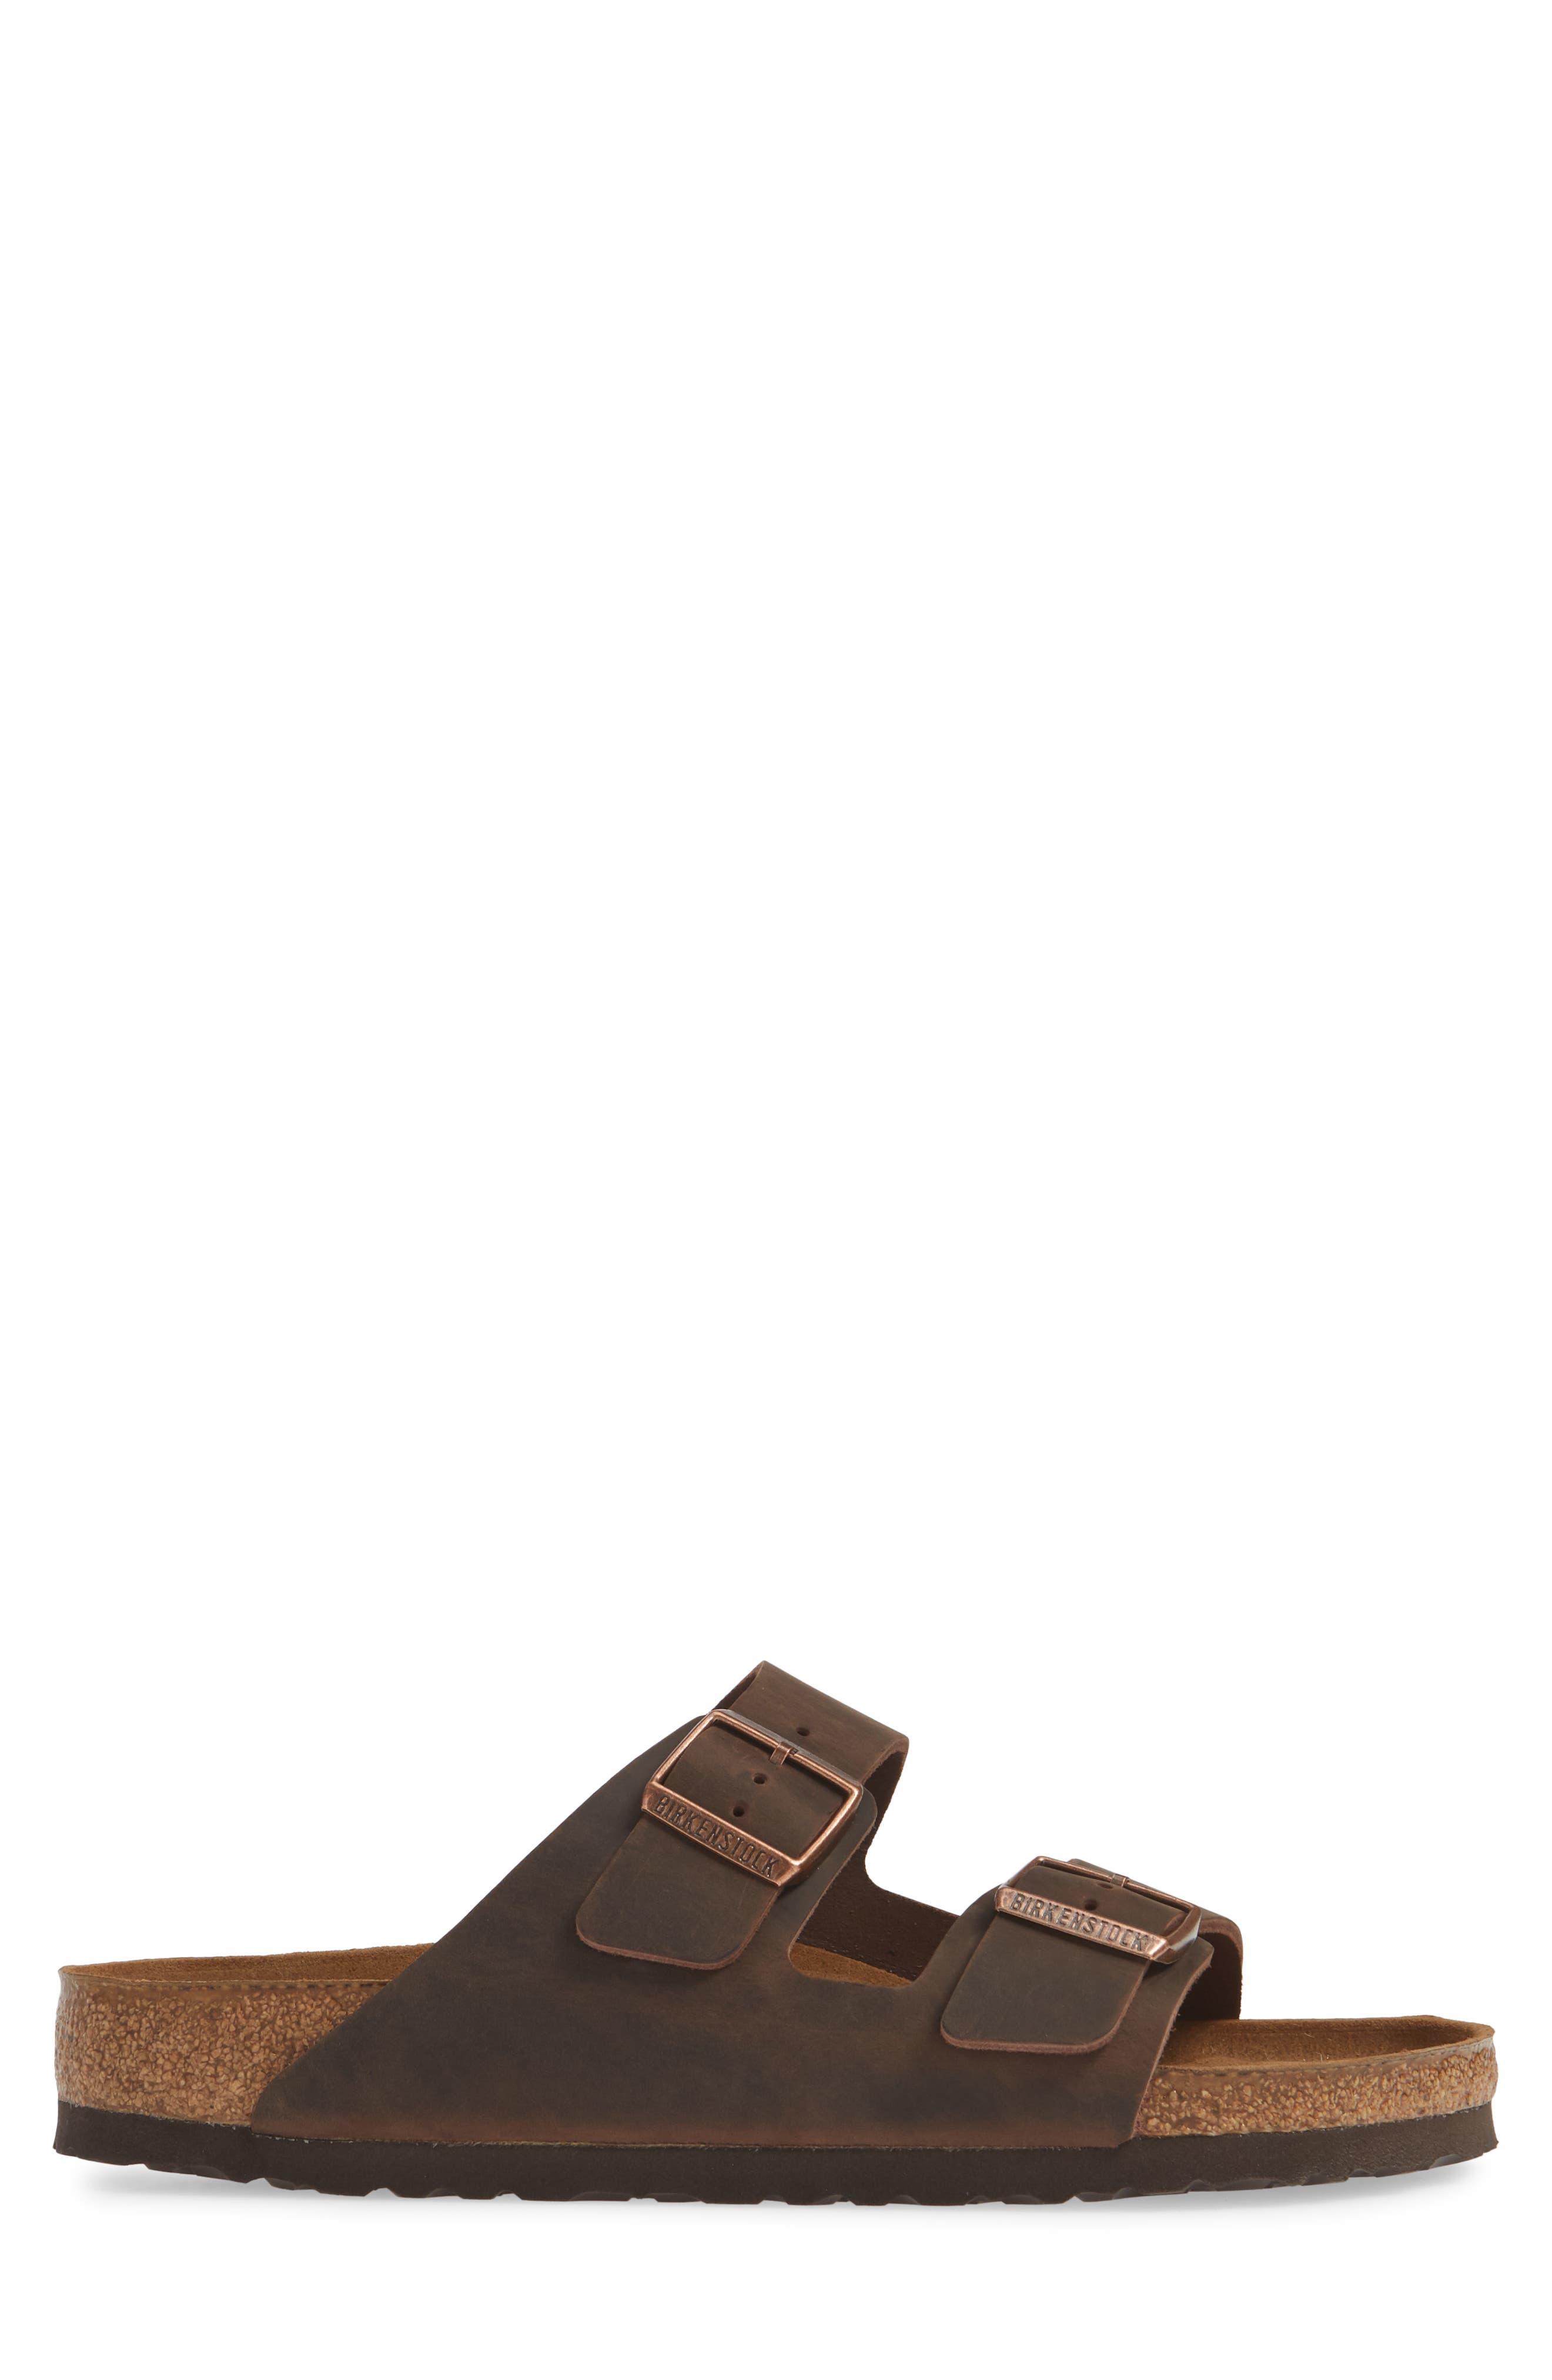 BIRKENSTOCK, Arizona Soft Slide Sandal, Alternate thumbnail 4, color, HABANA